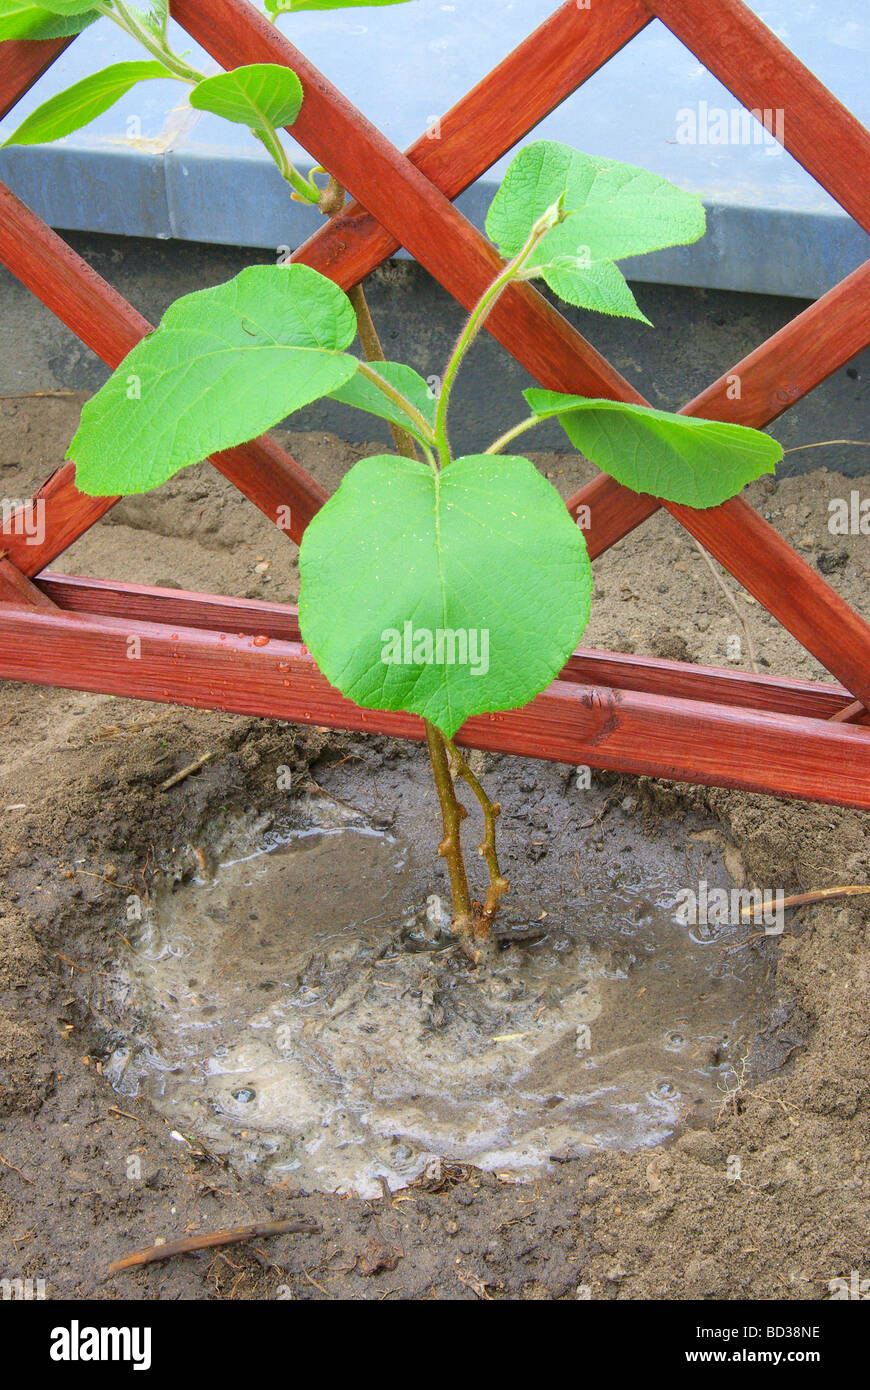 Kiwipflanze pflanzen planting a kiwi plant 10 - Stock Image